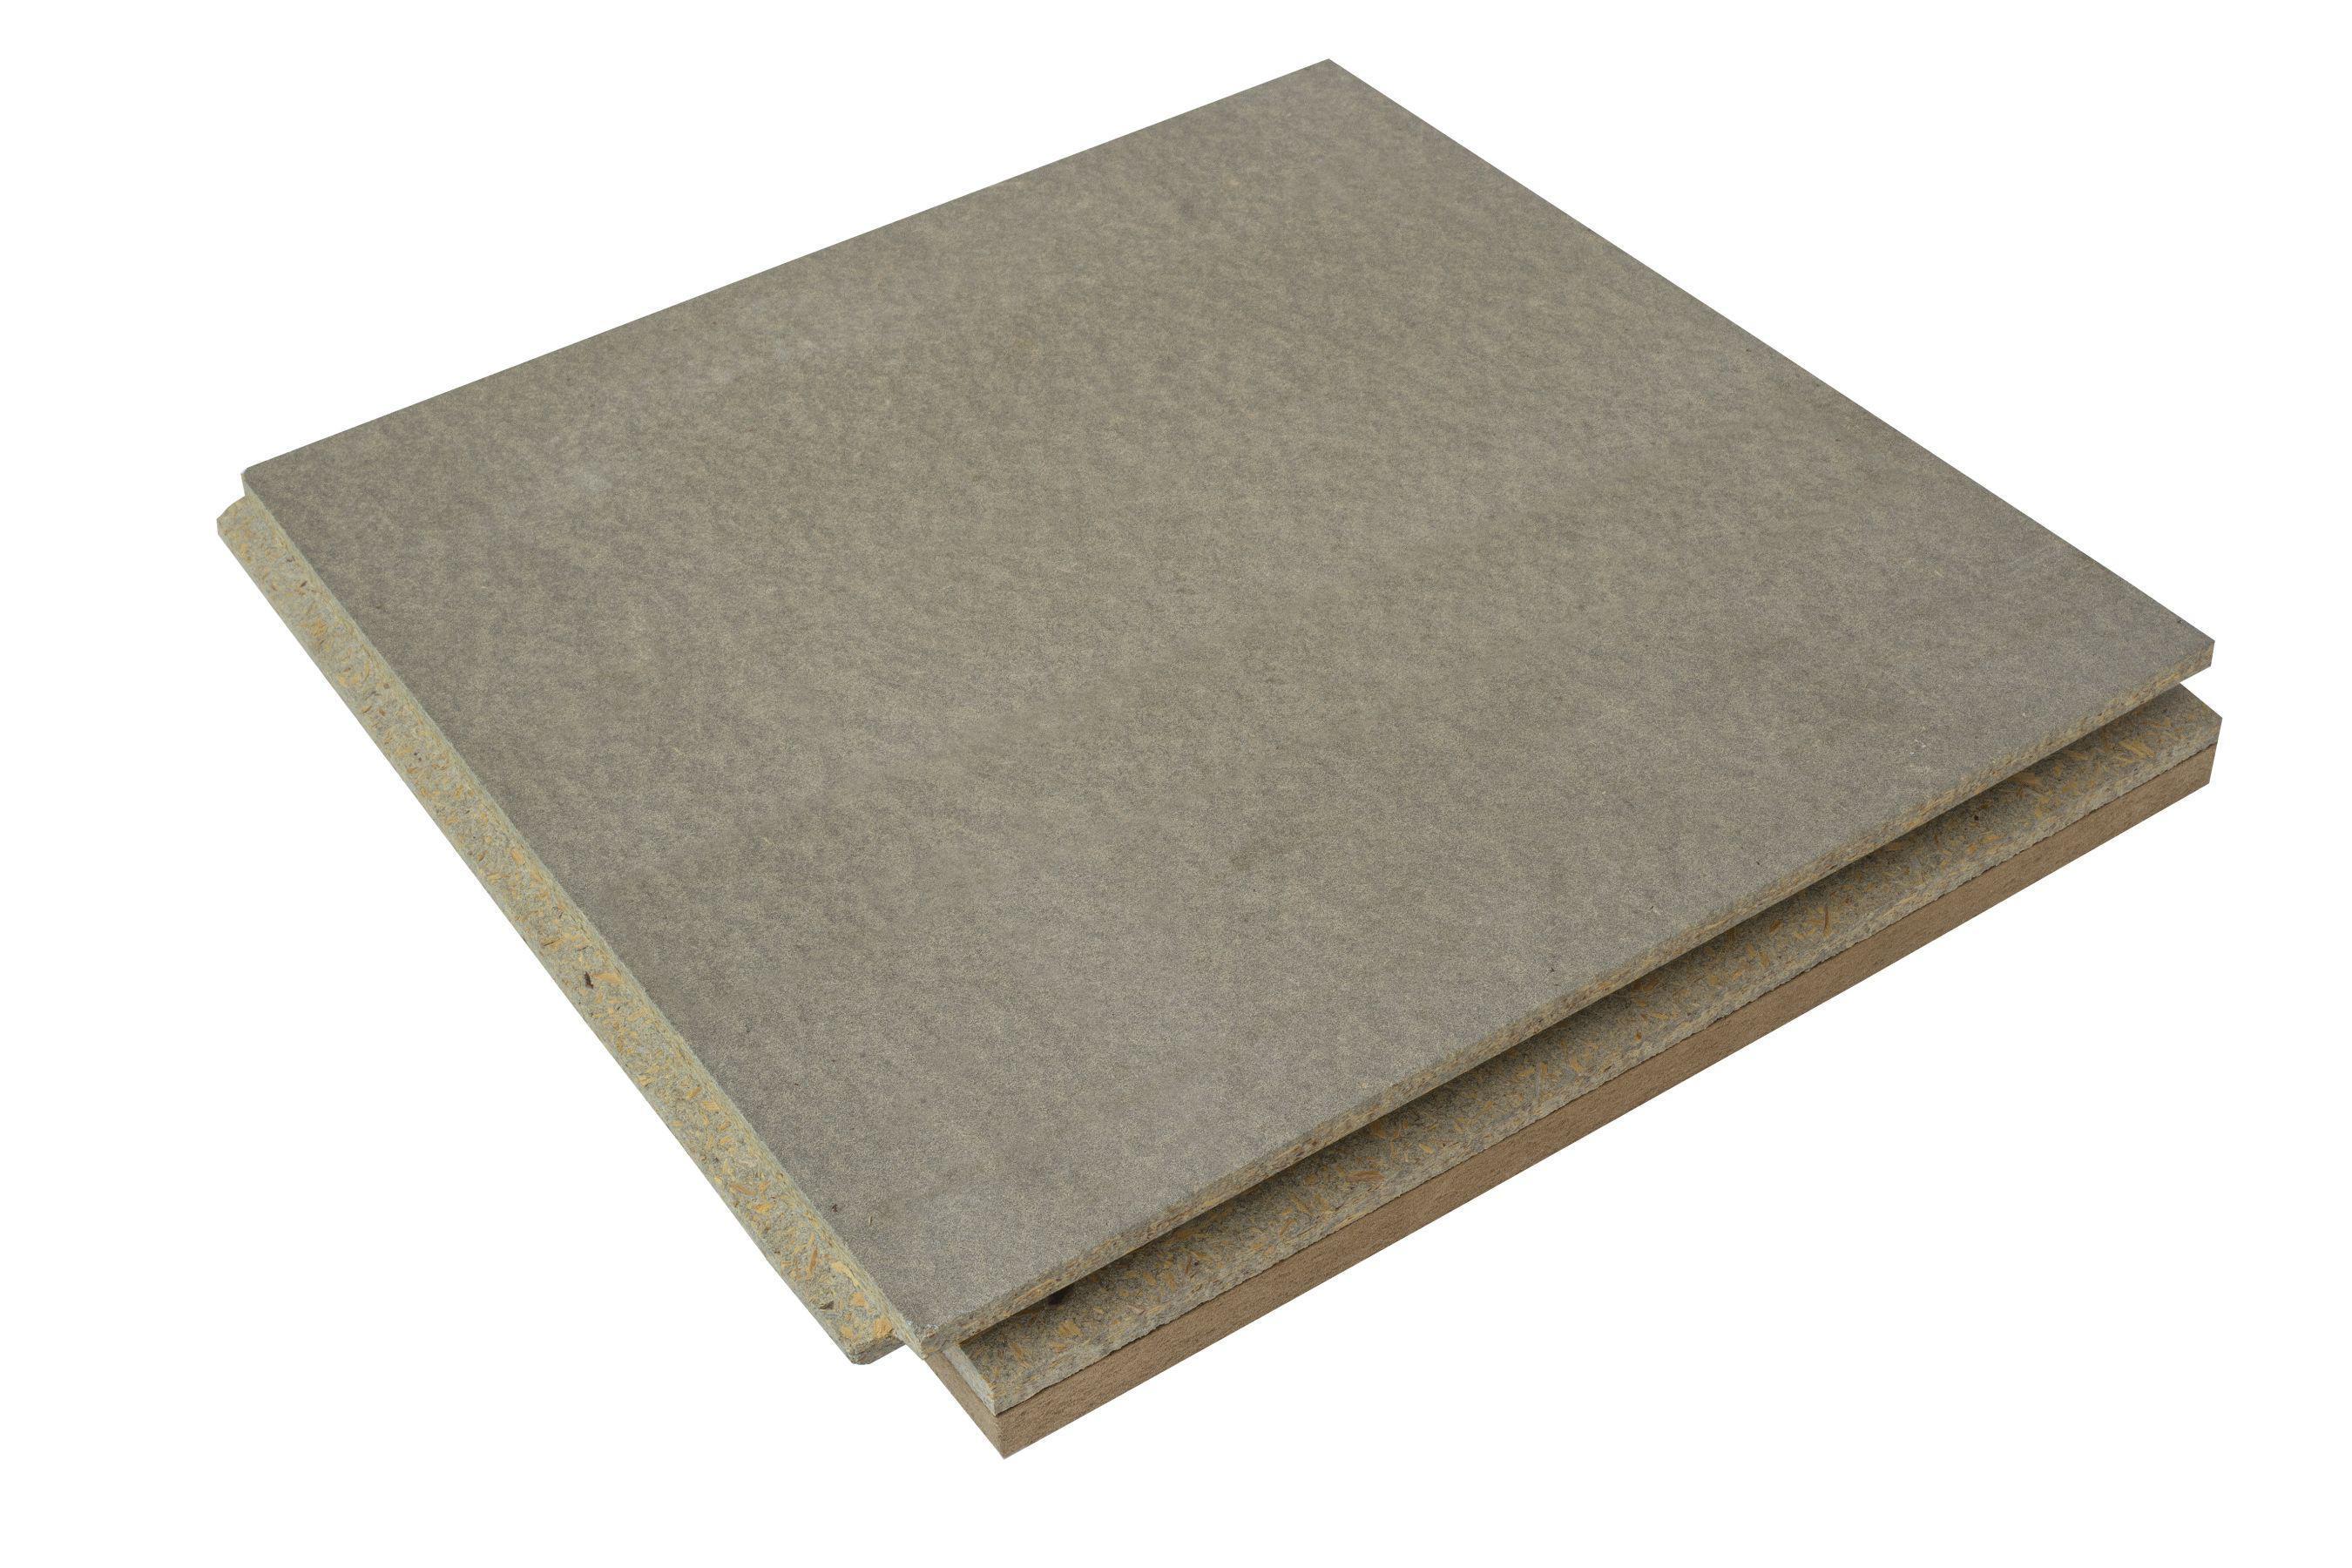 CETRIS - cement-bonded particle board for building industry - Cetris